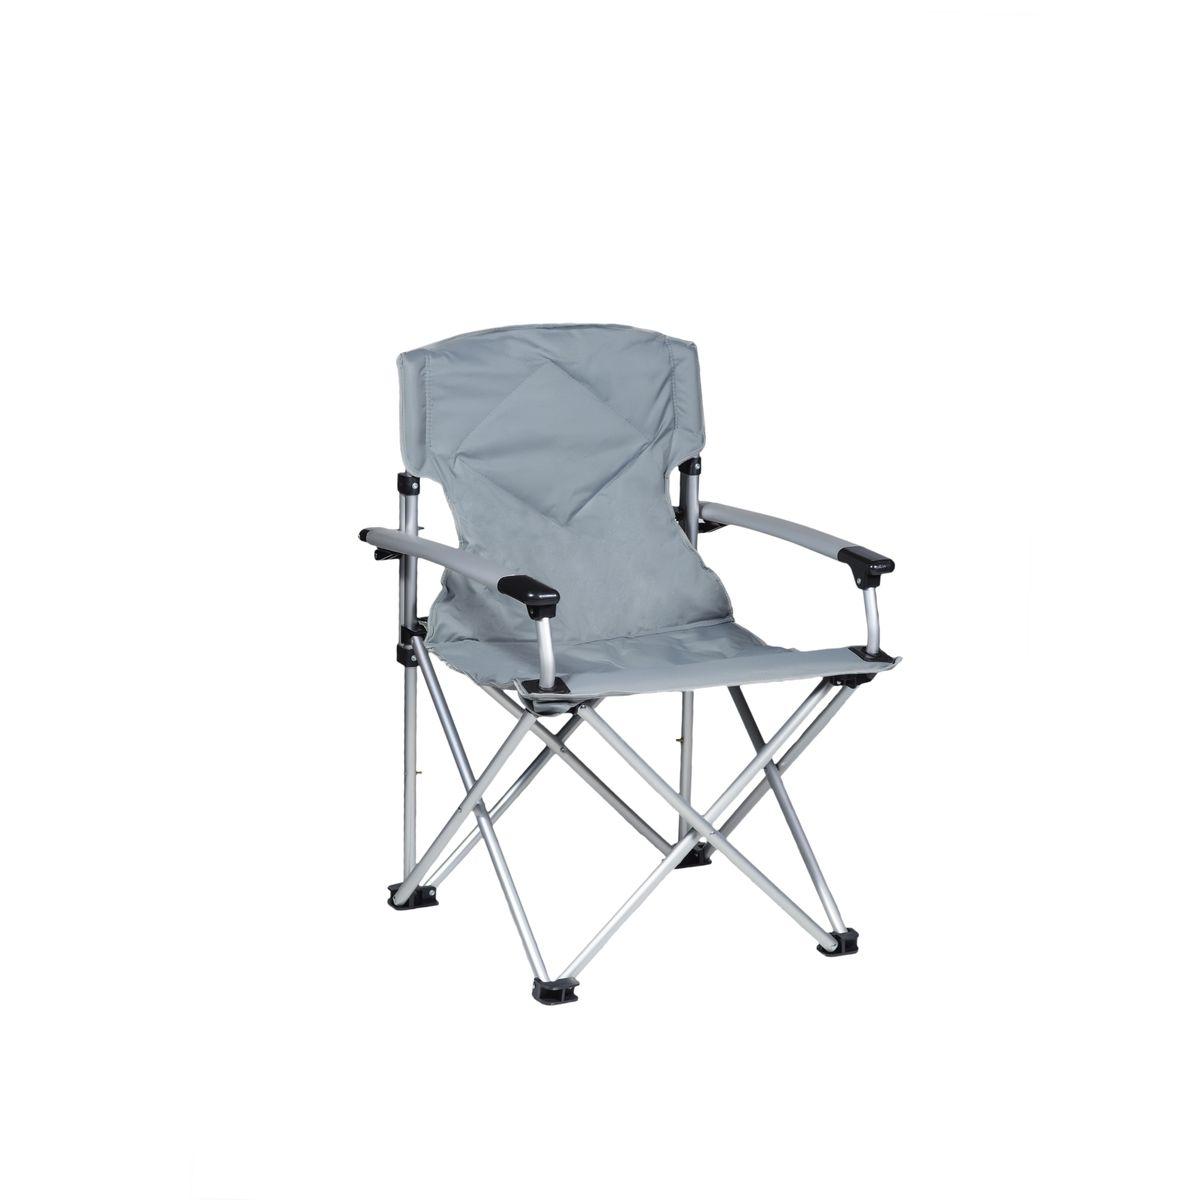 Кресло складное Green Glade M2306, 65 см х 66 см х 95 см